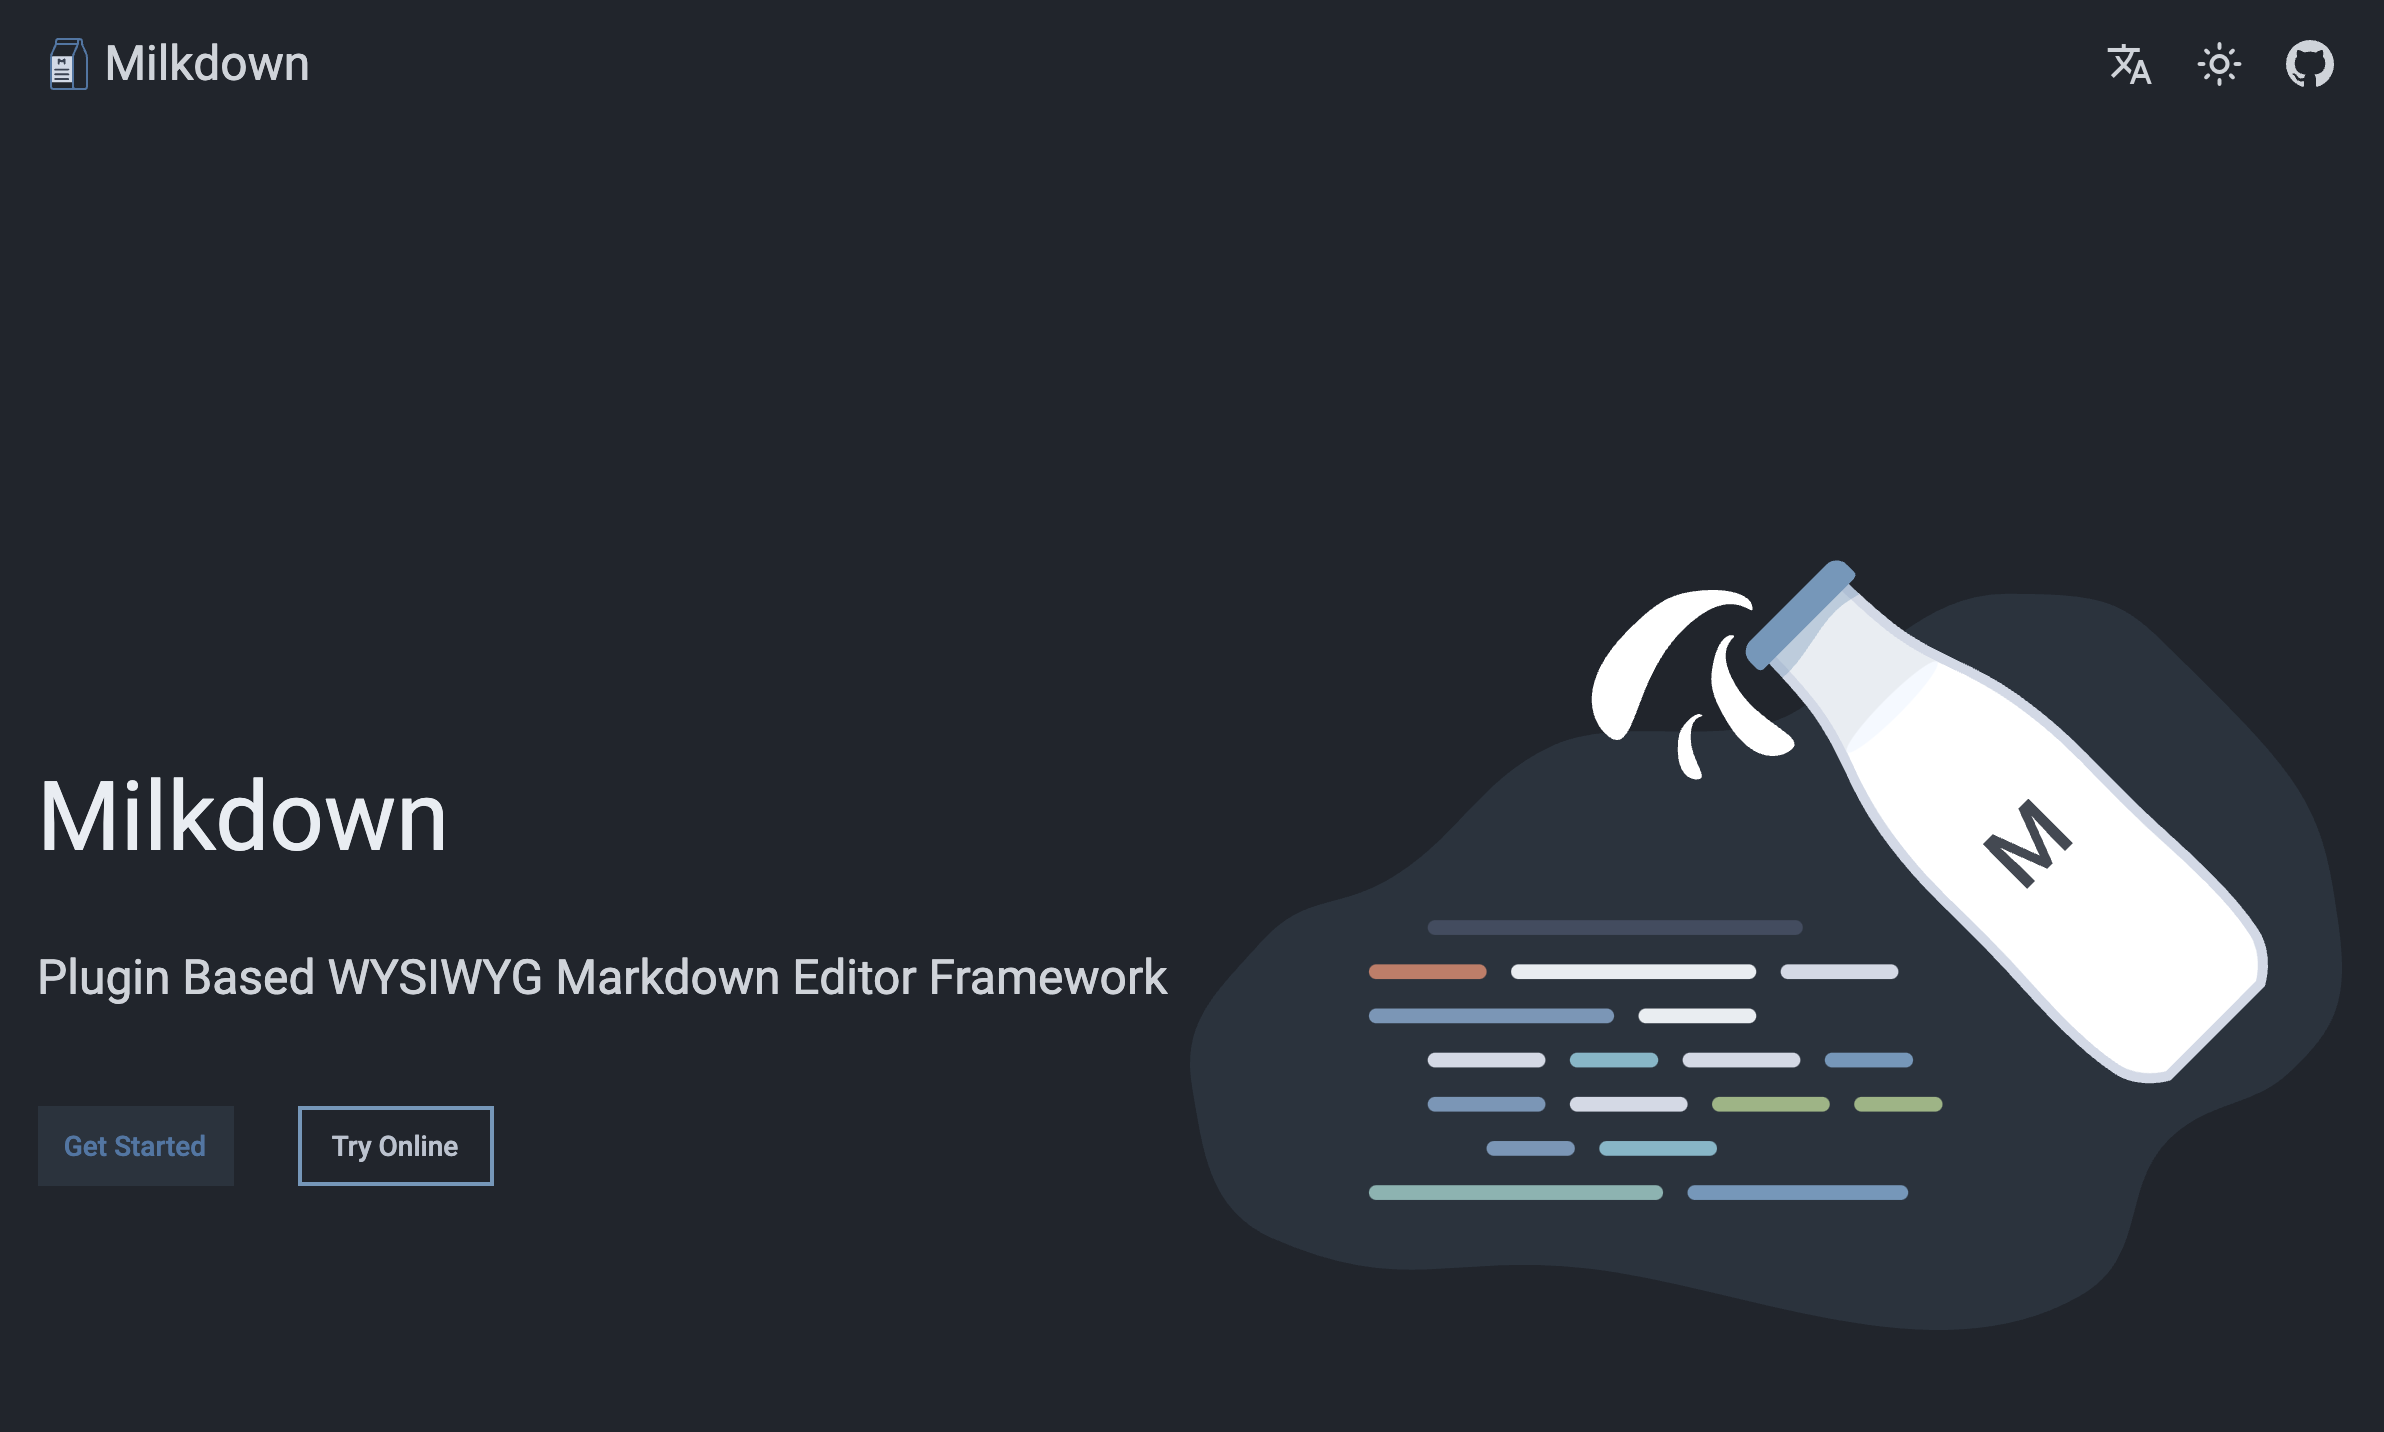 MilkDown-Pluggable Markdown Editor image